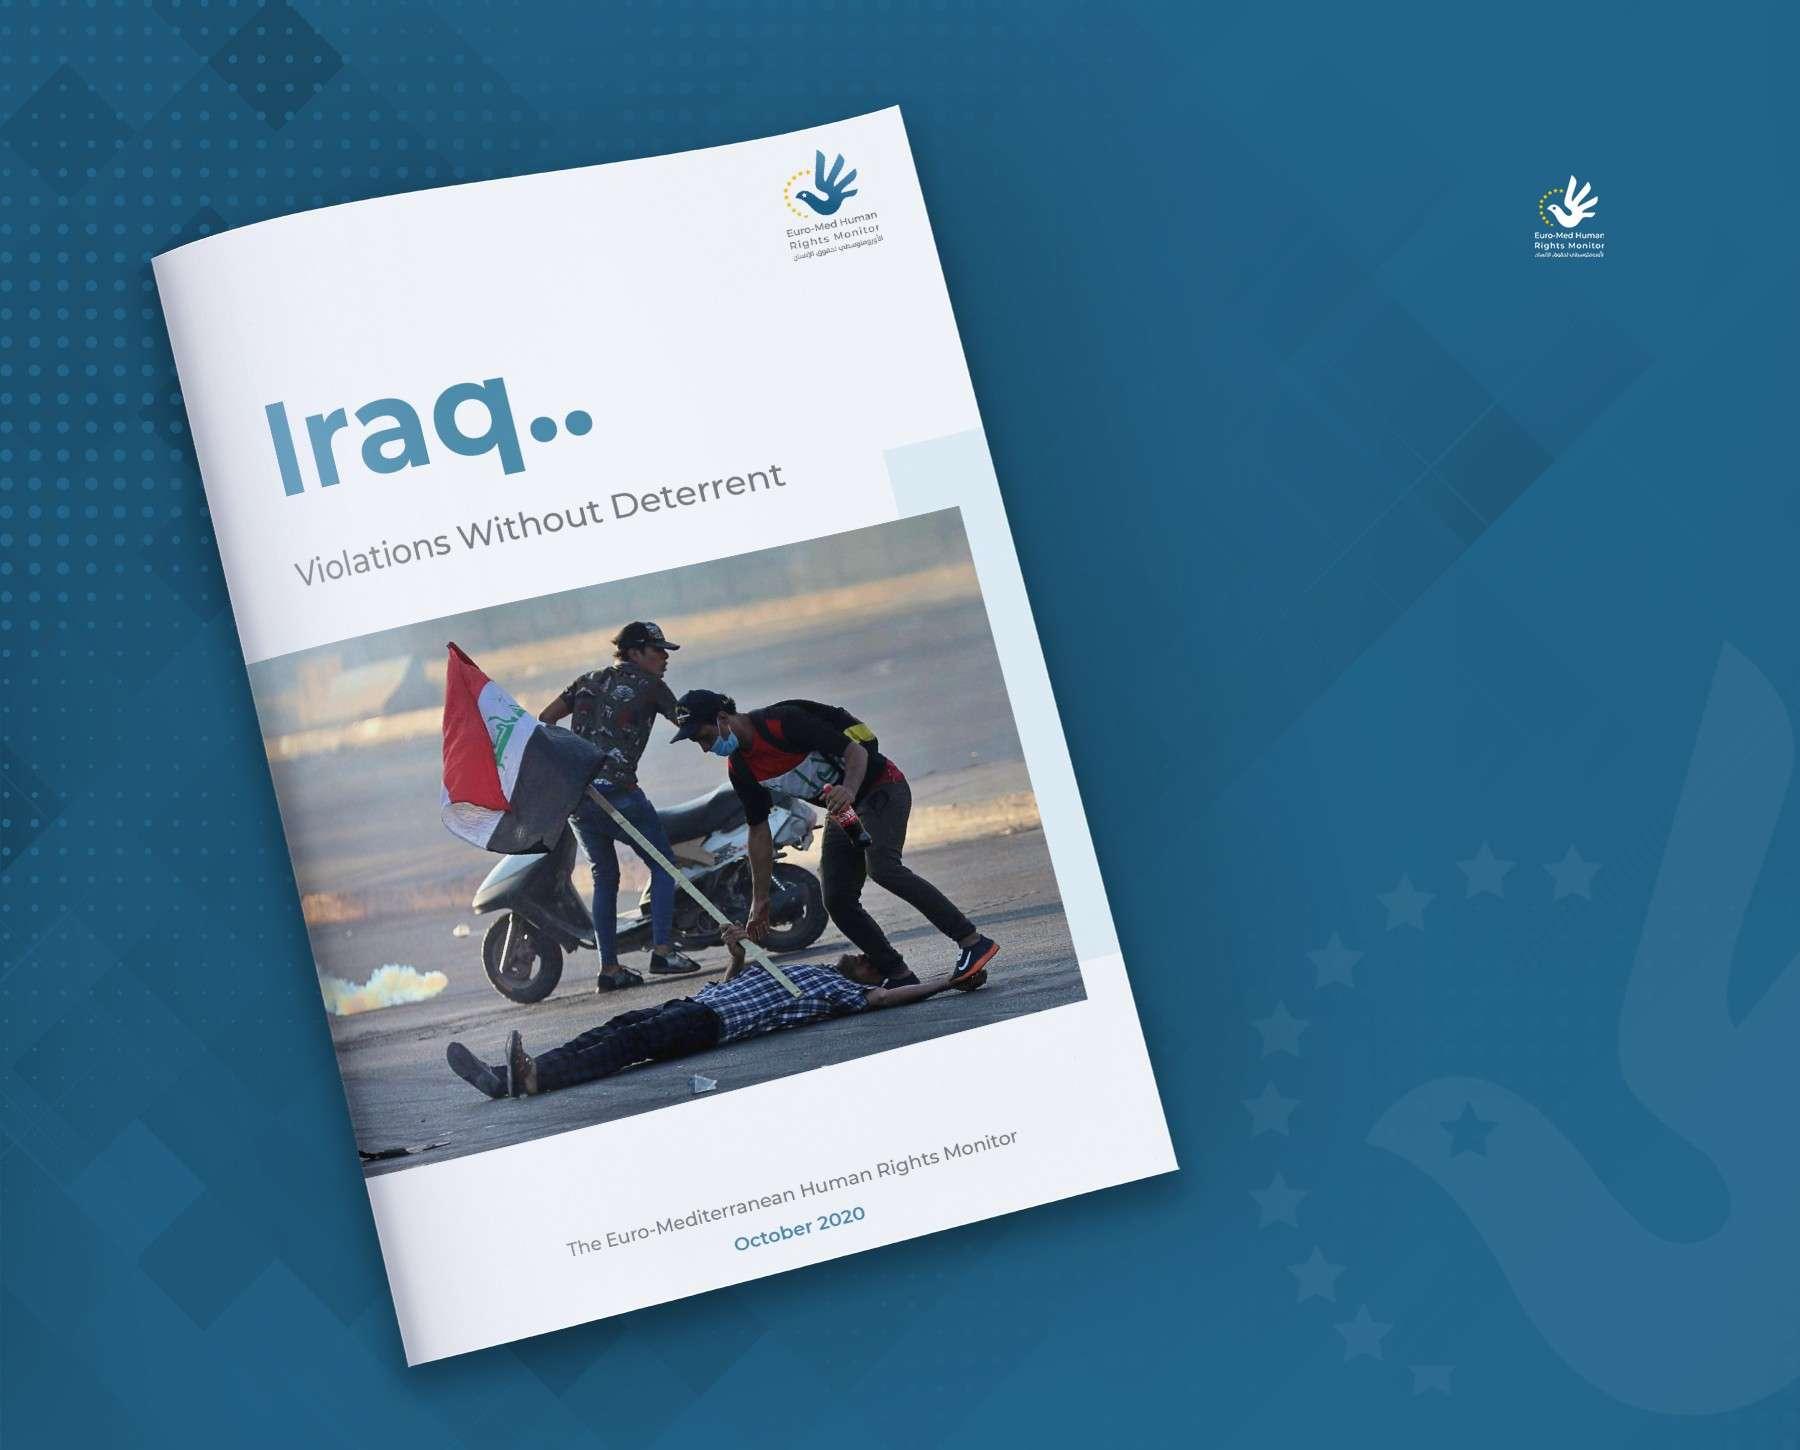 Iraq: Violations Without Deterrent